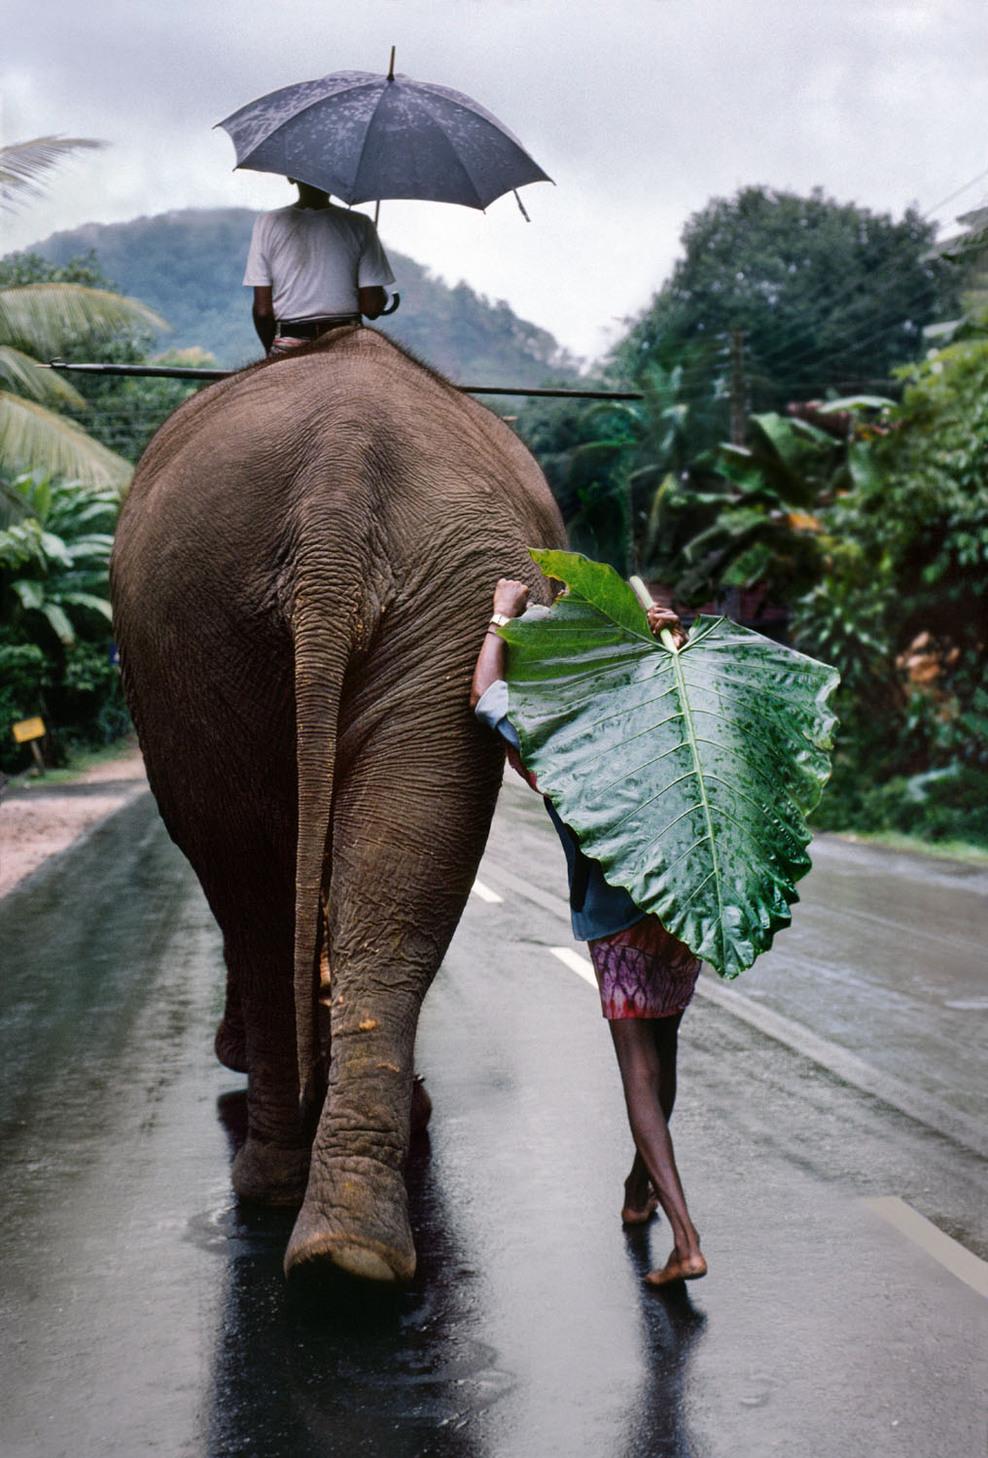 jap, elefanten - immernoch!